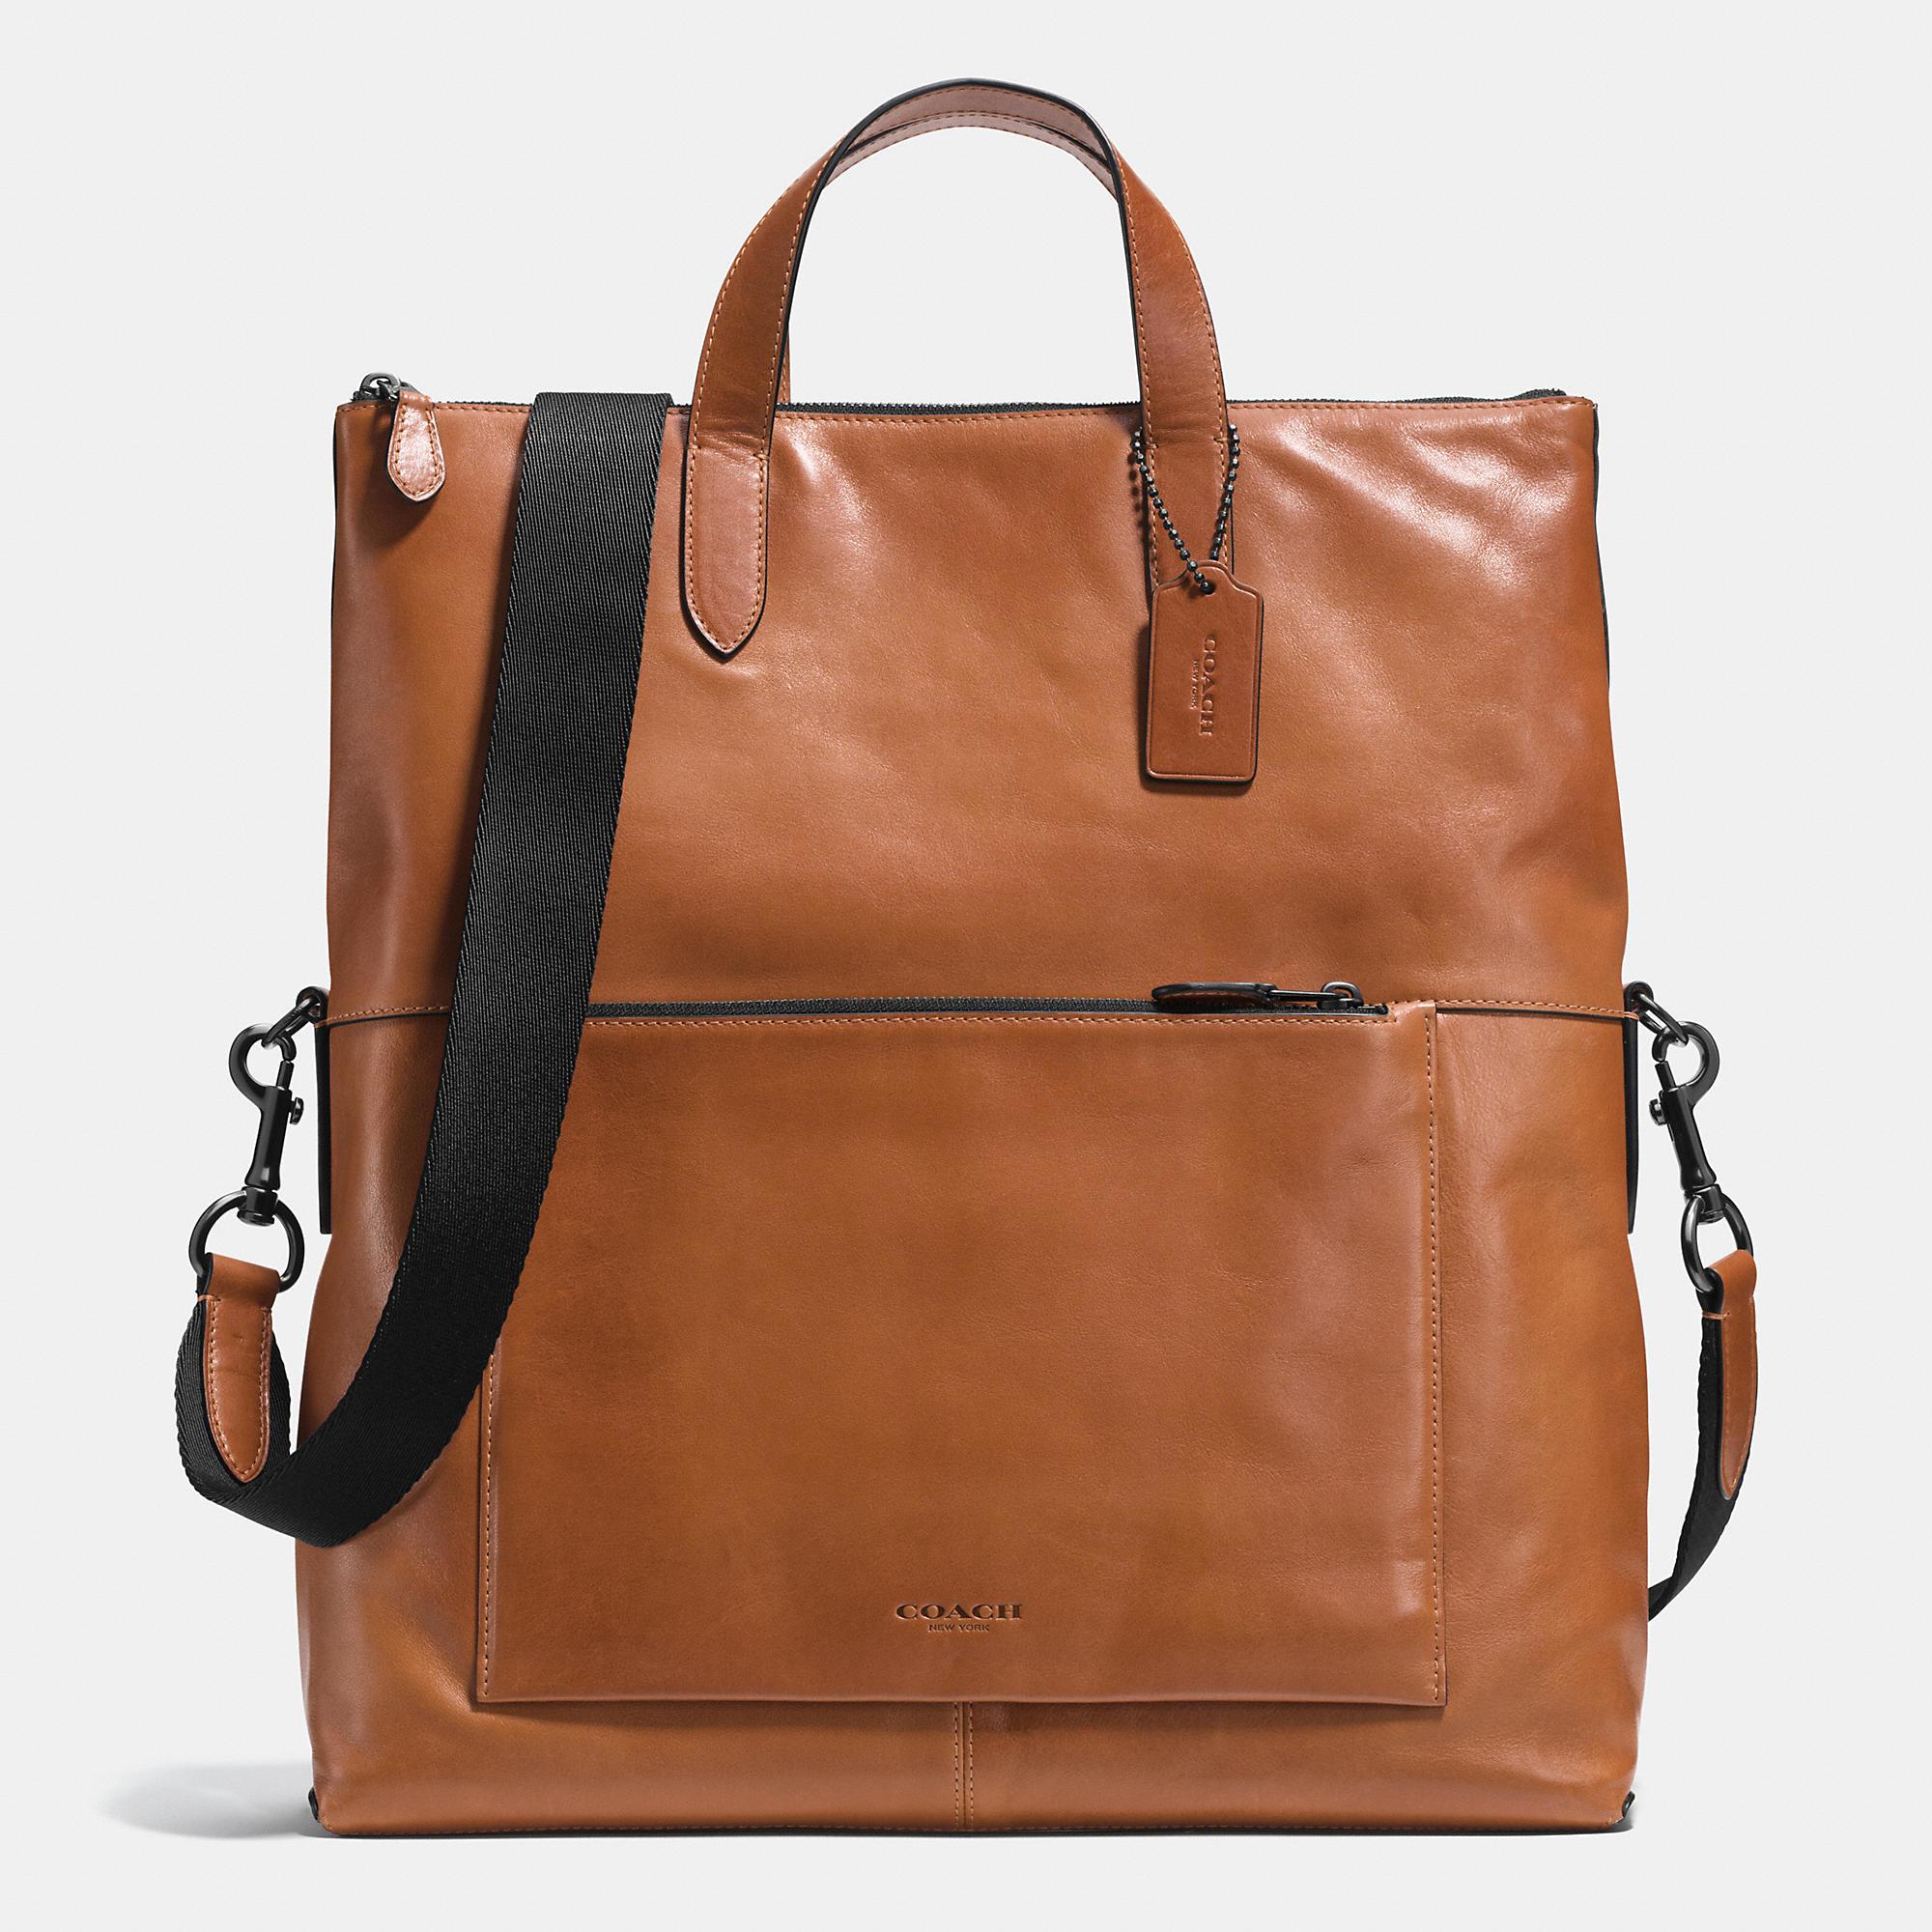 1a83abafeb0e ... get lyst coach manhattan foldover tote in sport calf leather in brown  5ba74 704dd